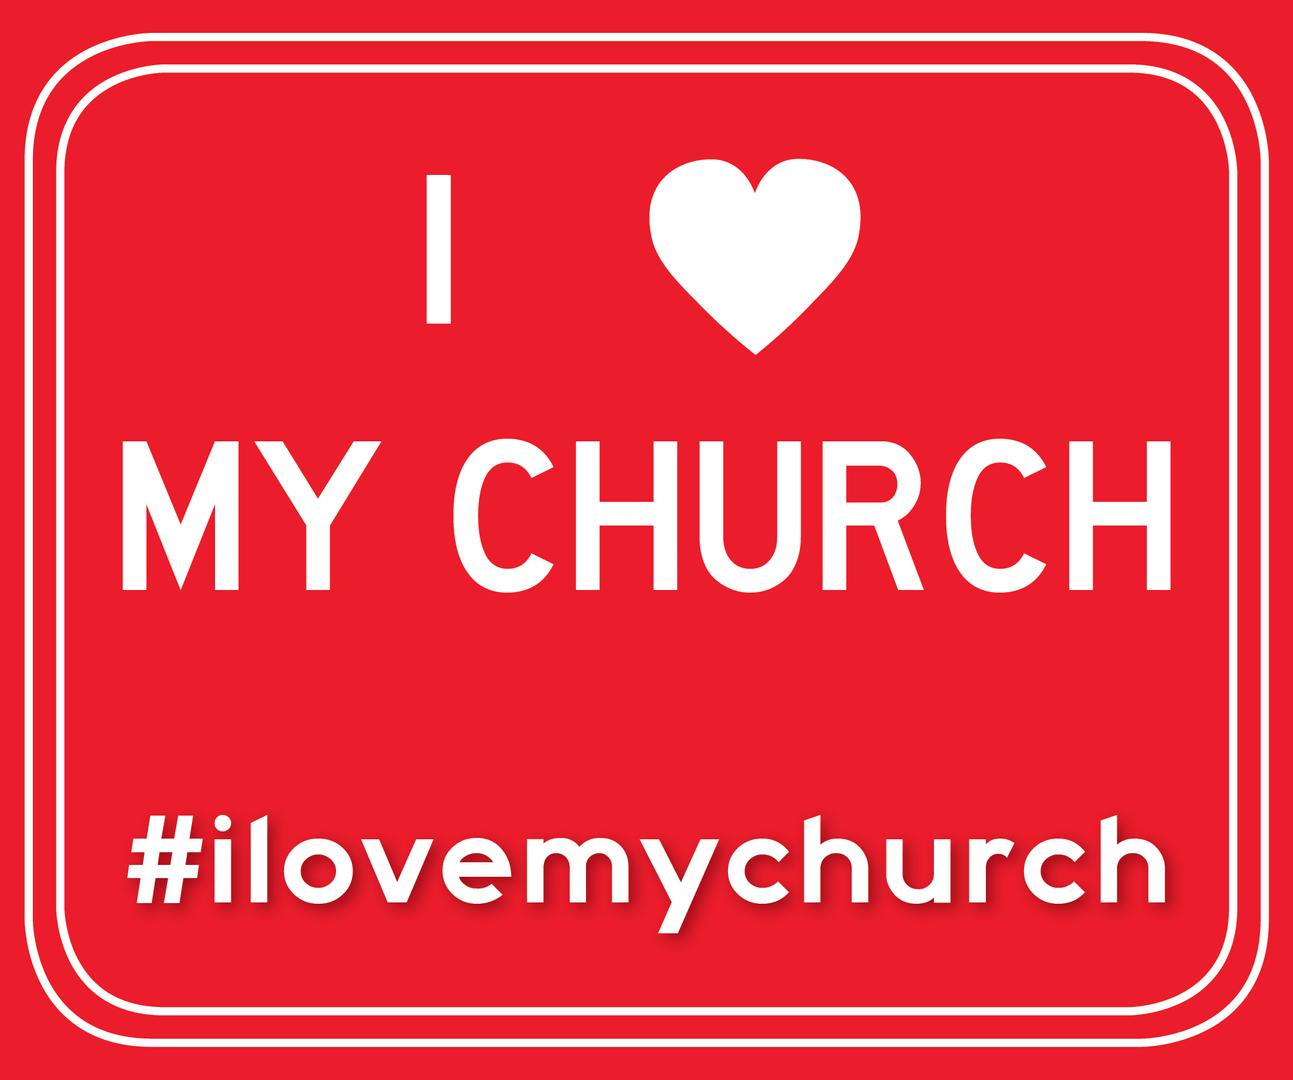 #ilovemychurch campaign post.png